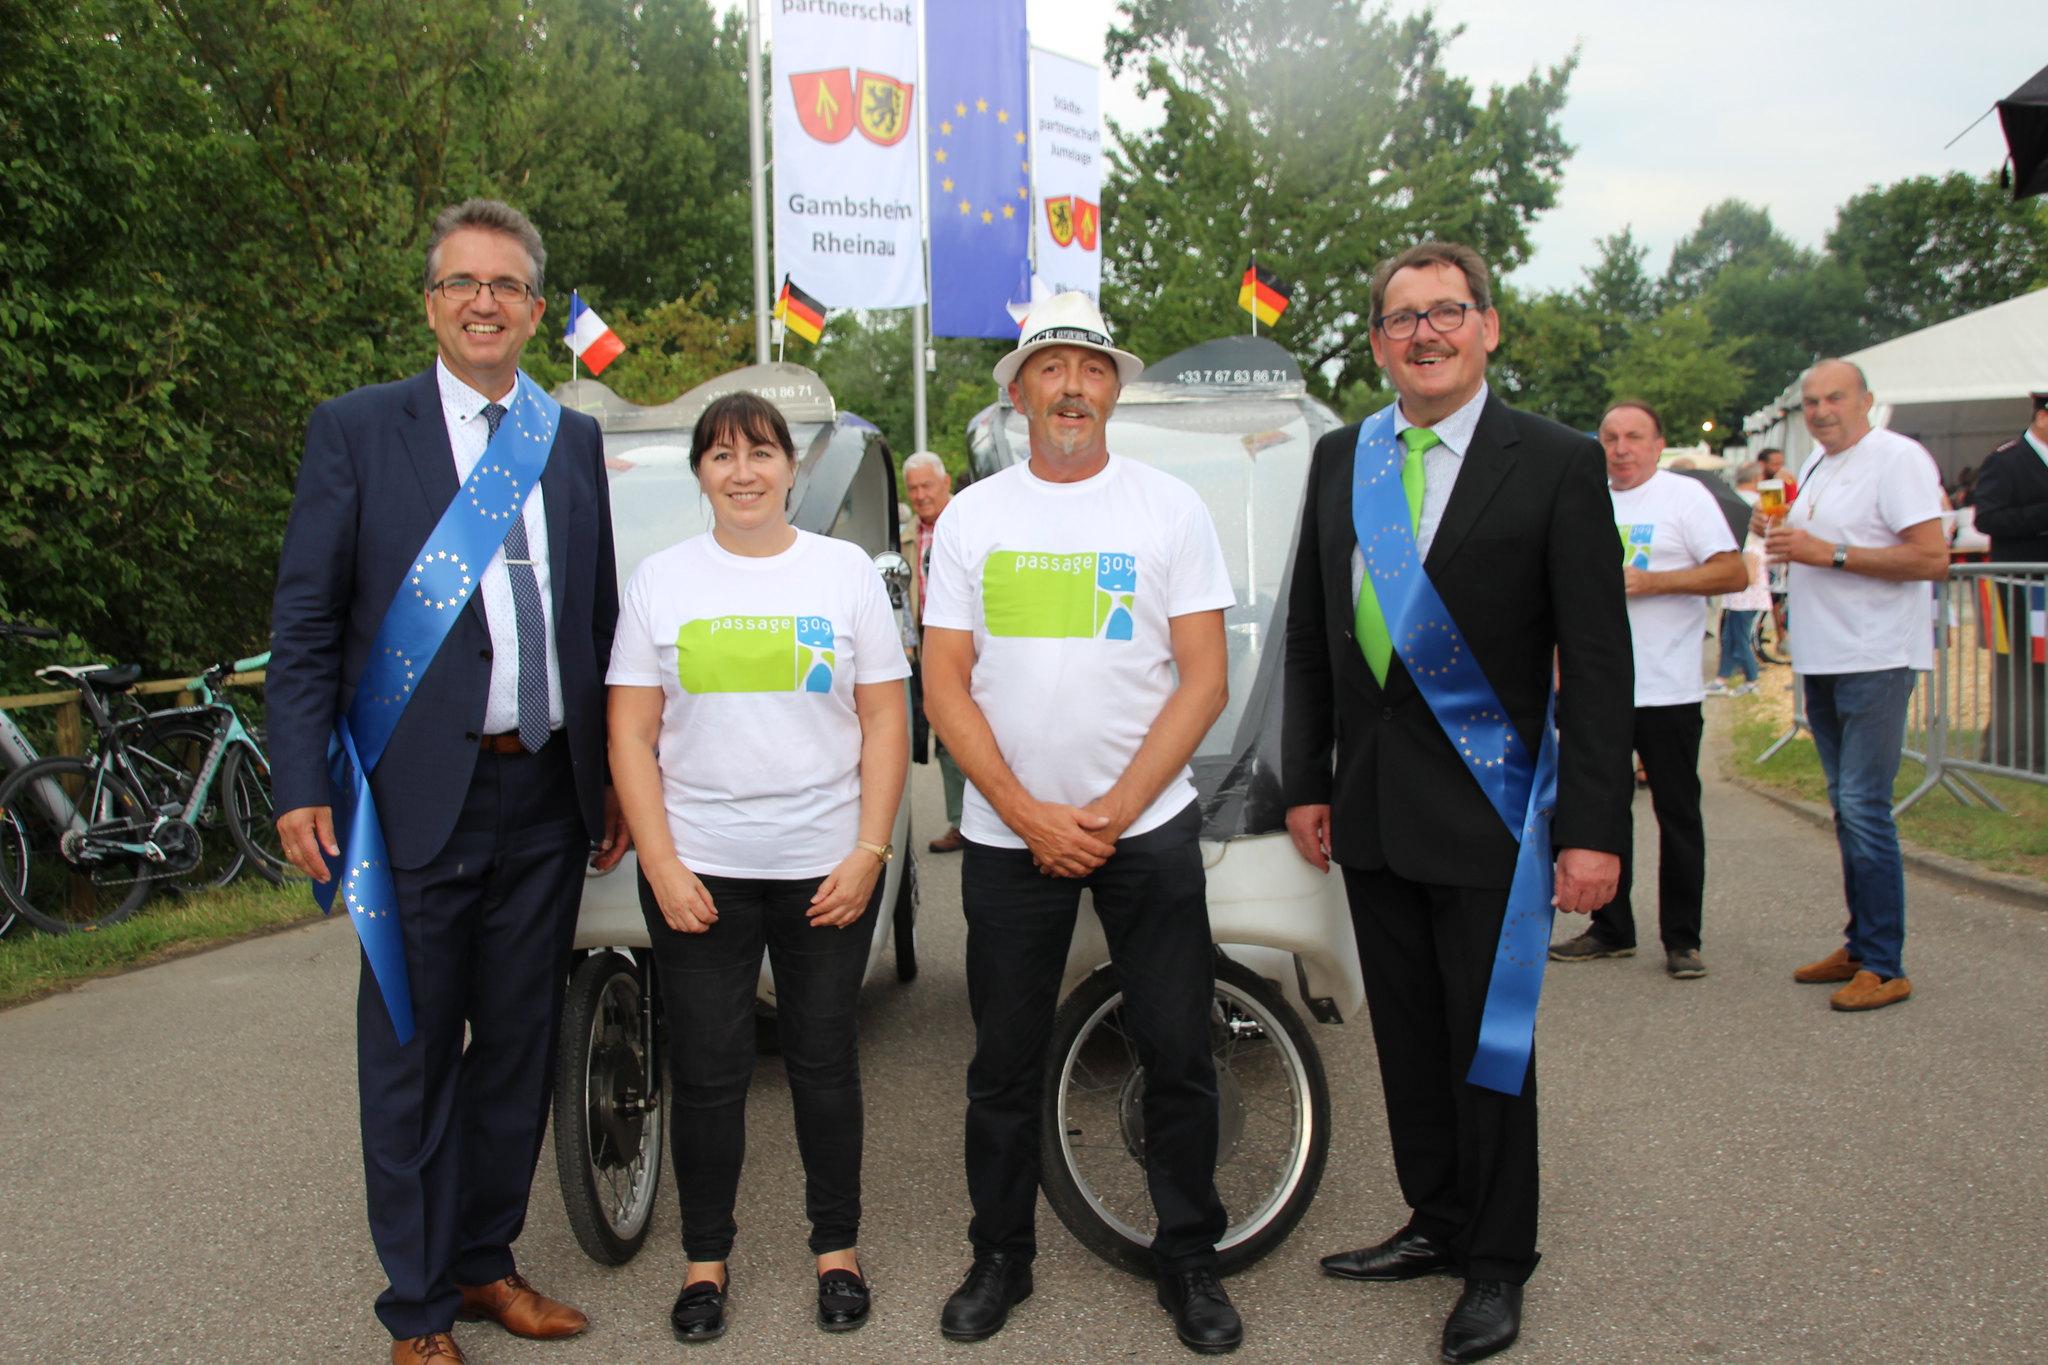 Feier der Städtepartnerschaft Rheinau / Gambsheim am 22. Juni 2019